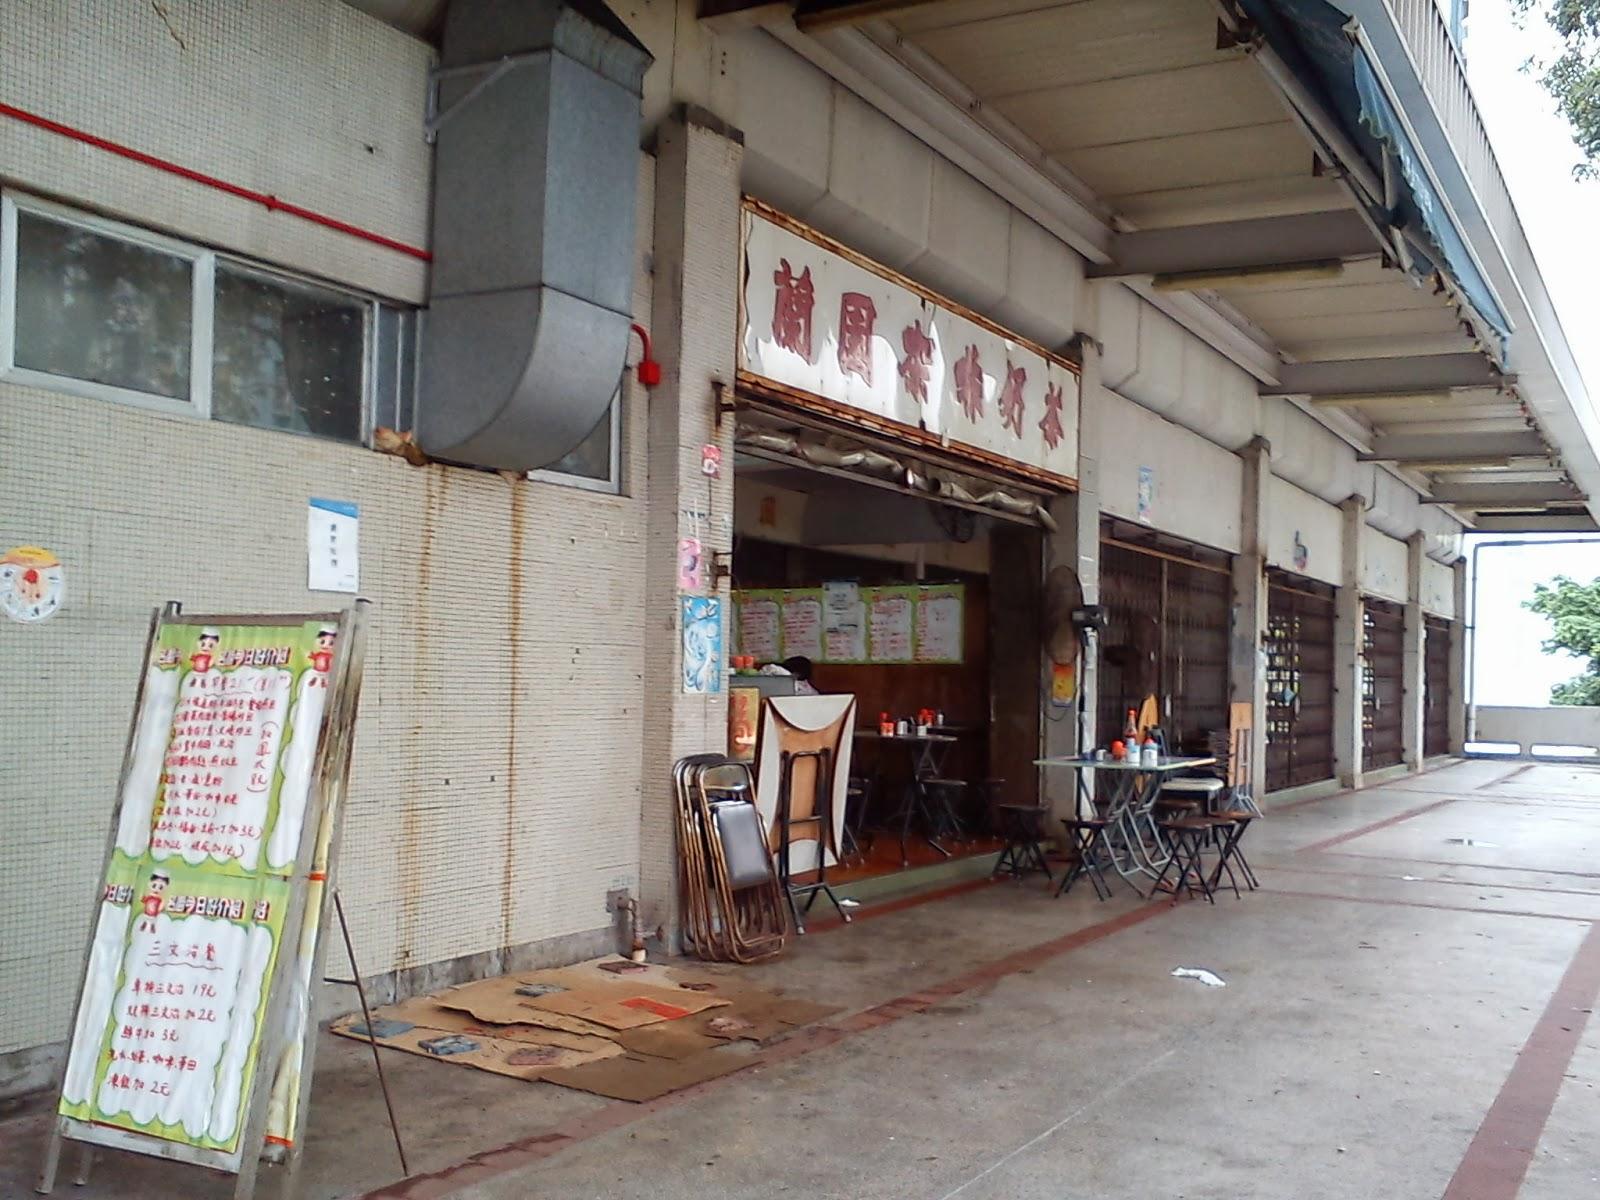 Grassroots O2: [房署商場] 白田商場 @2012-04-21